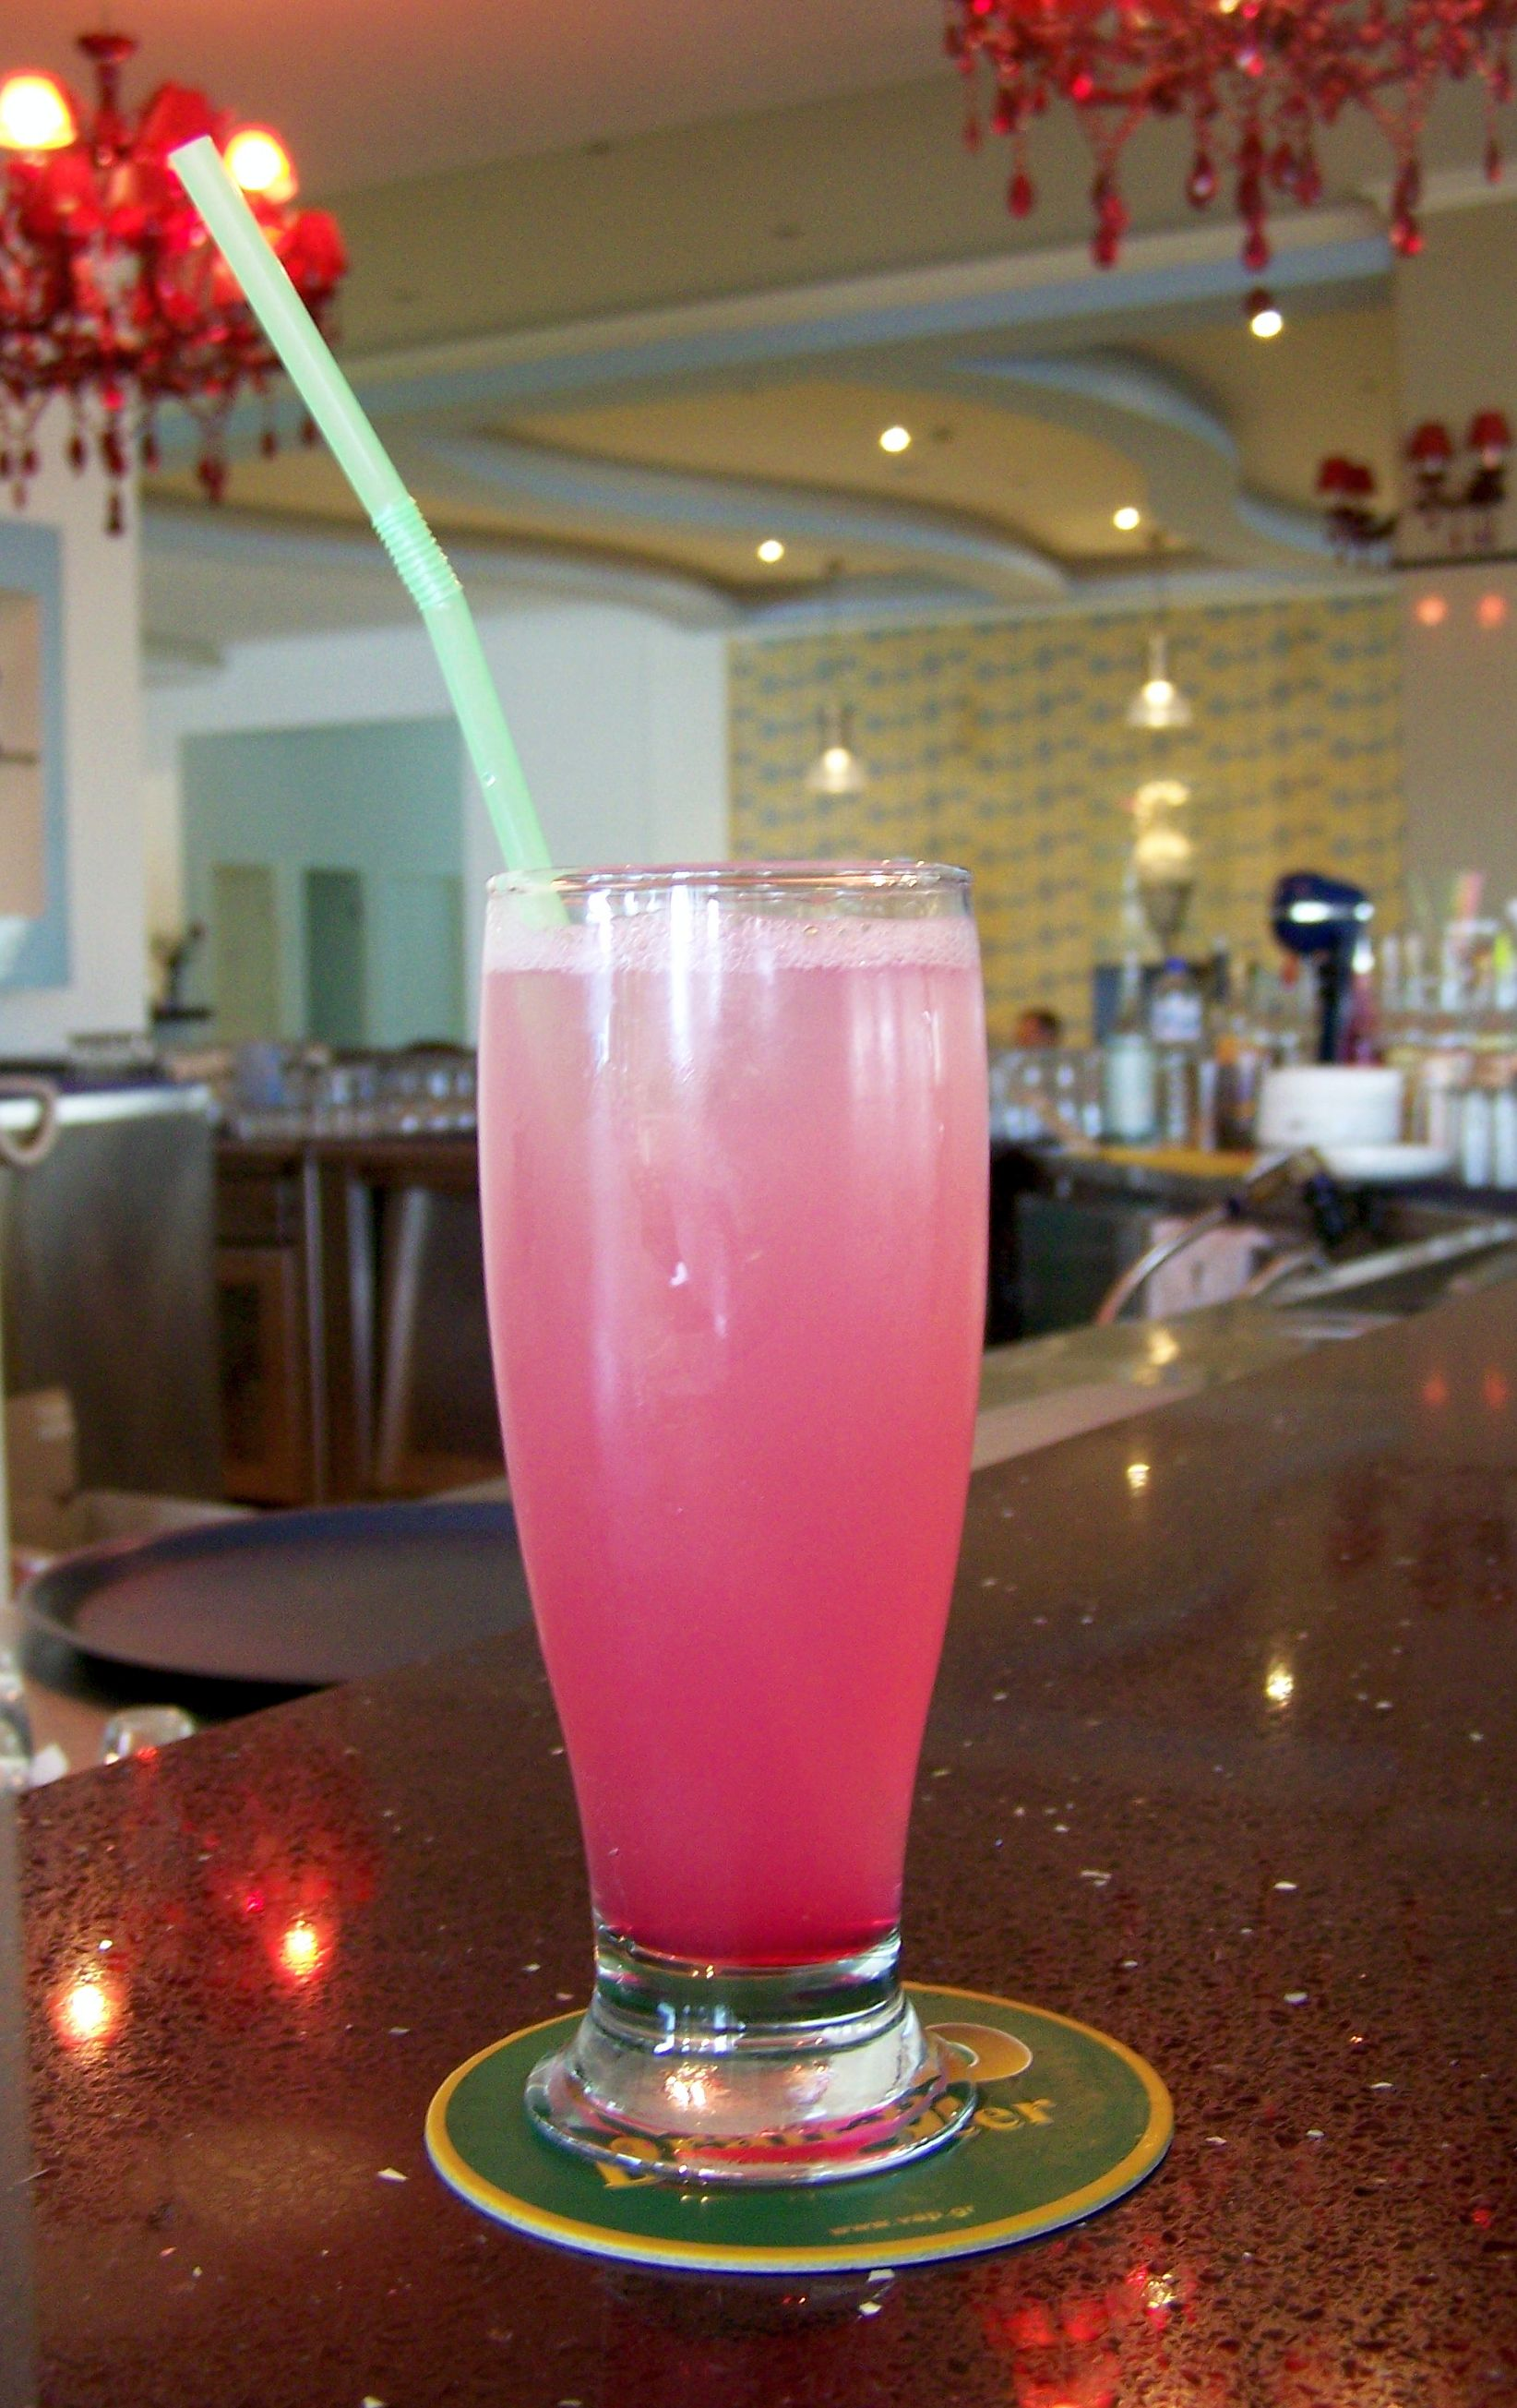 ... pink lady un pink lady cocktail pink lady pink lady pink lady pink